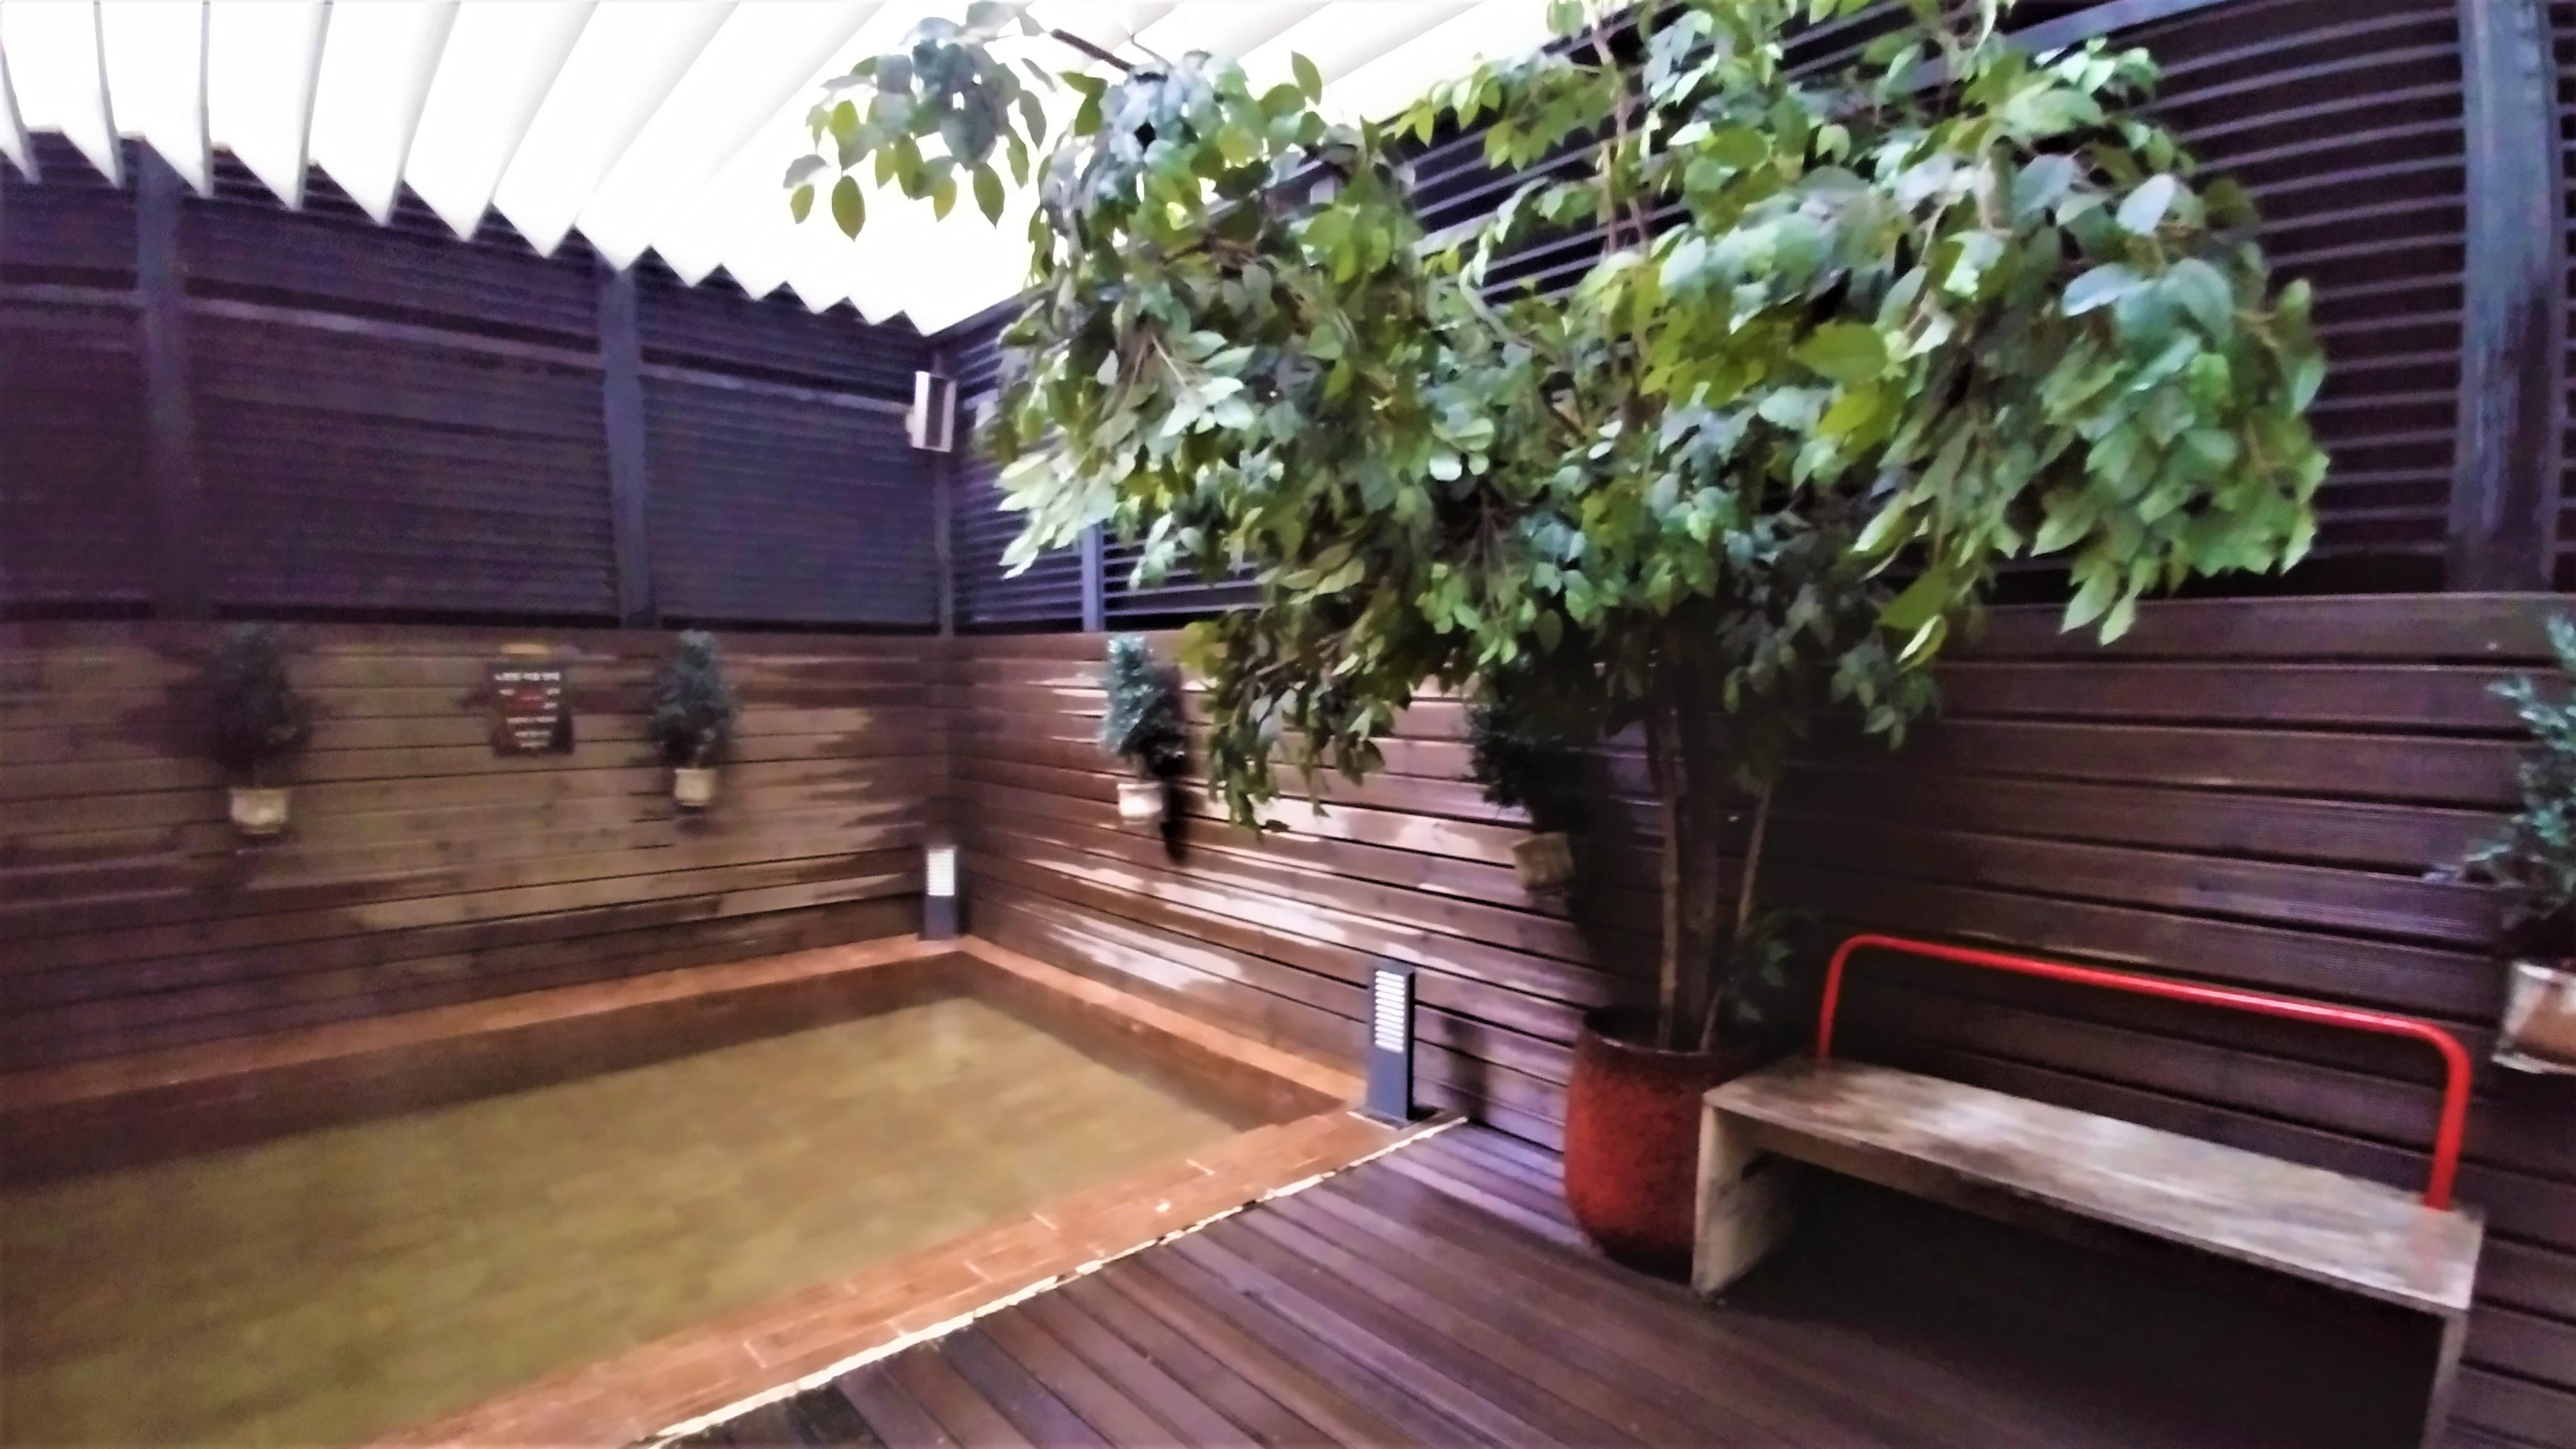 sauna jjimjilbang seoul coree du sud blog voyage asie arpenter le chemin